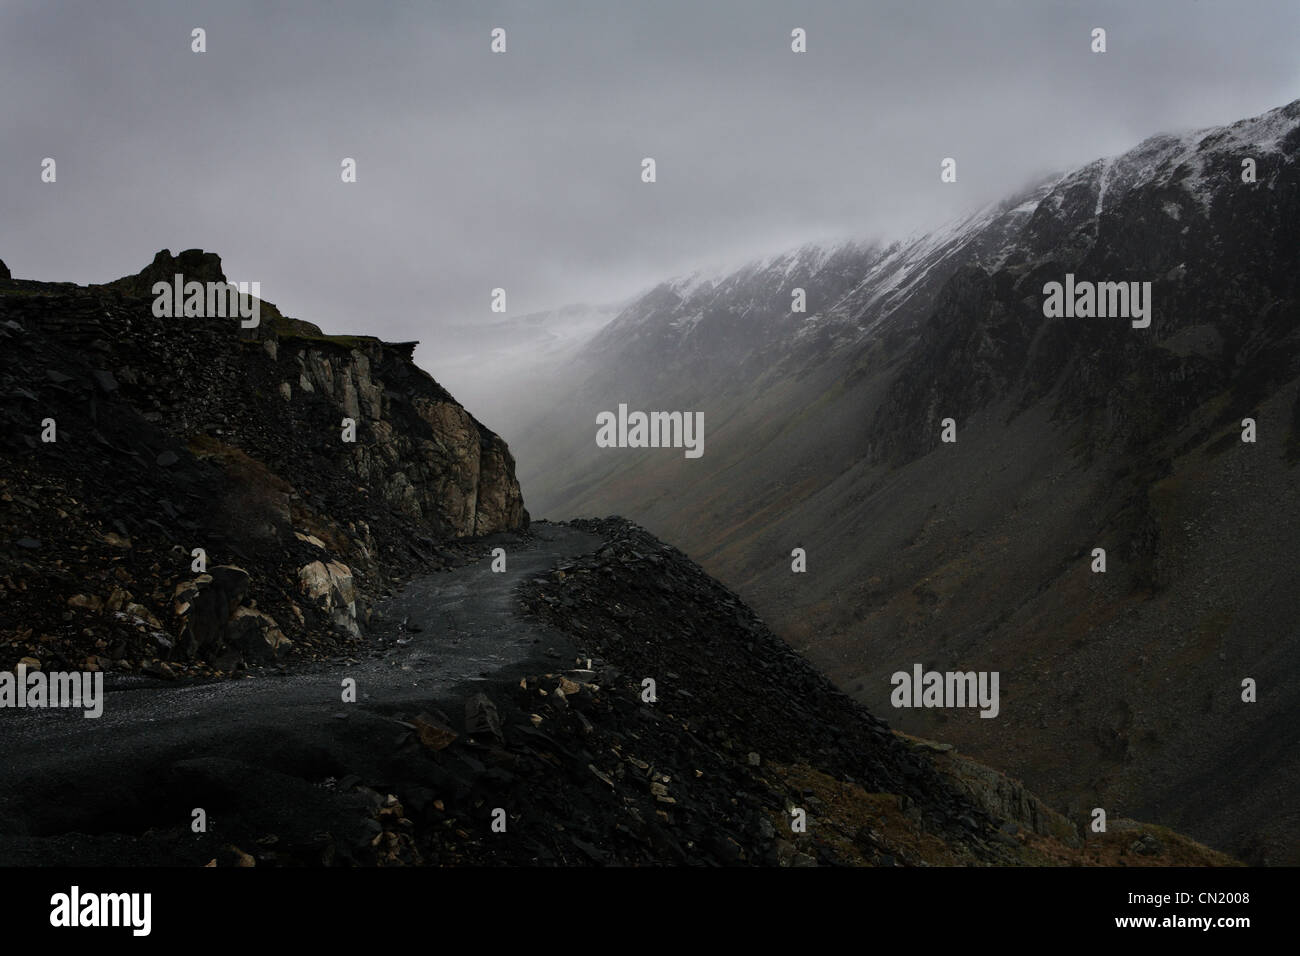 Misty mountain, Lake District, Cumbria, England, UK - Stock Image